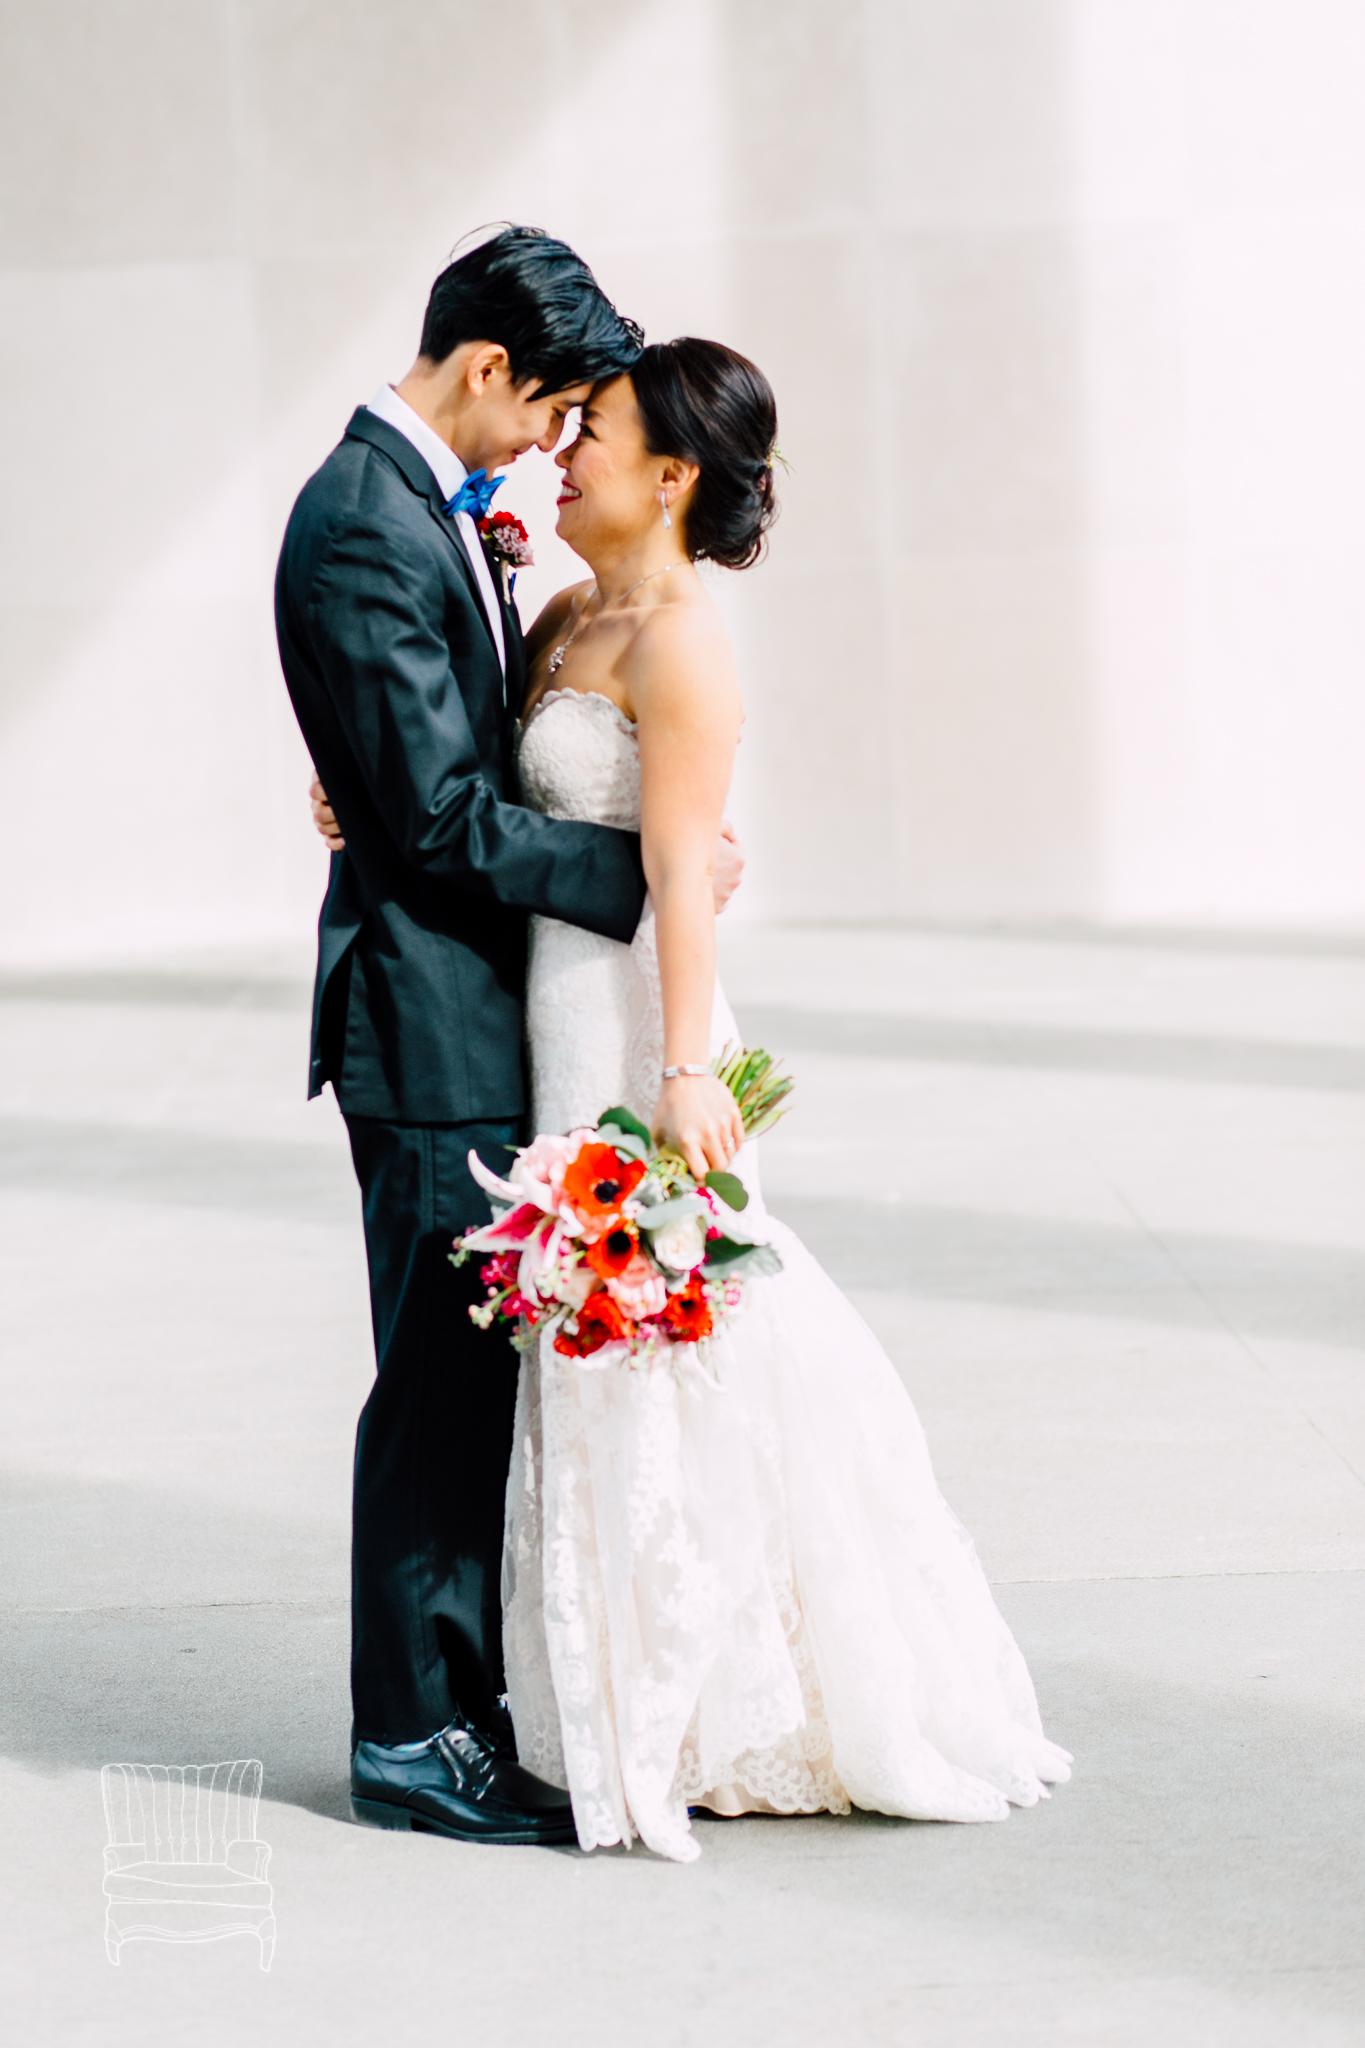 seattle-wedding-photographer-kartheryn-moran-yovithomas-4.JPG